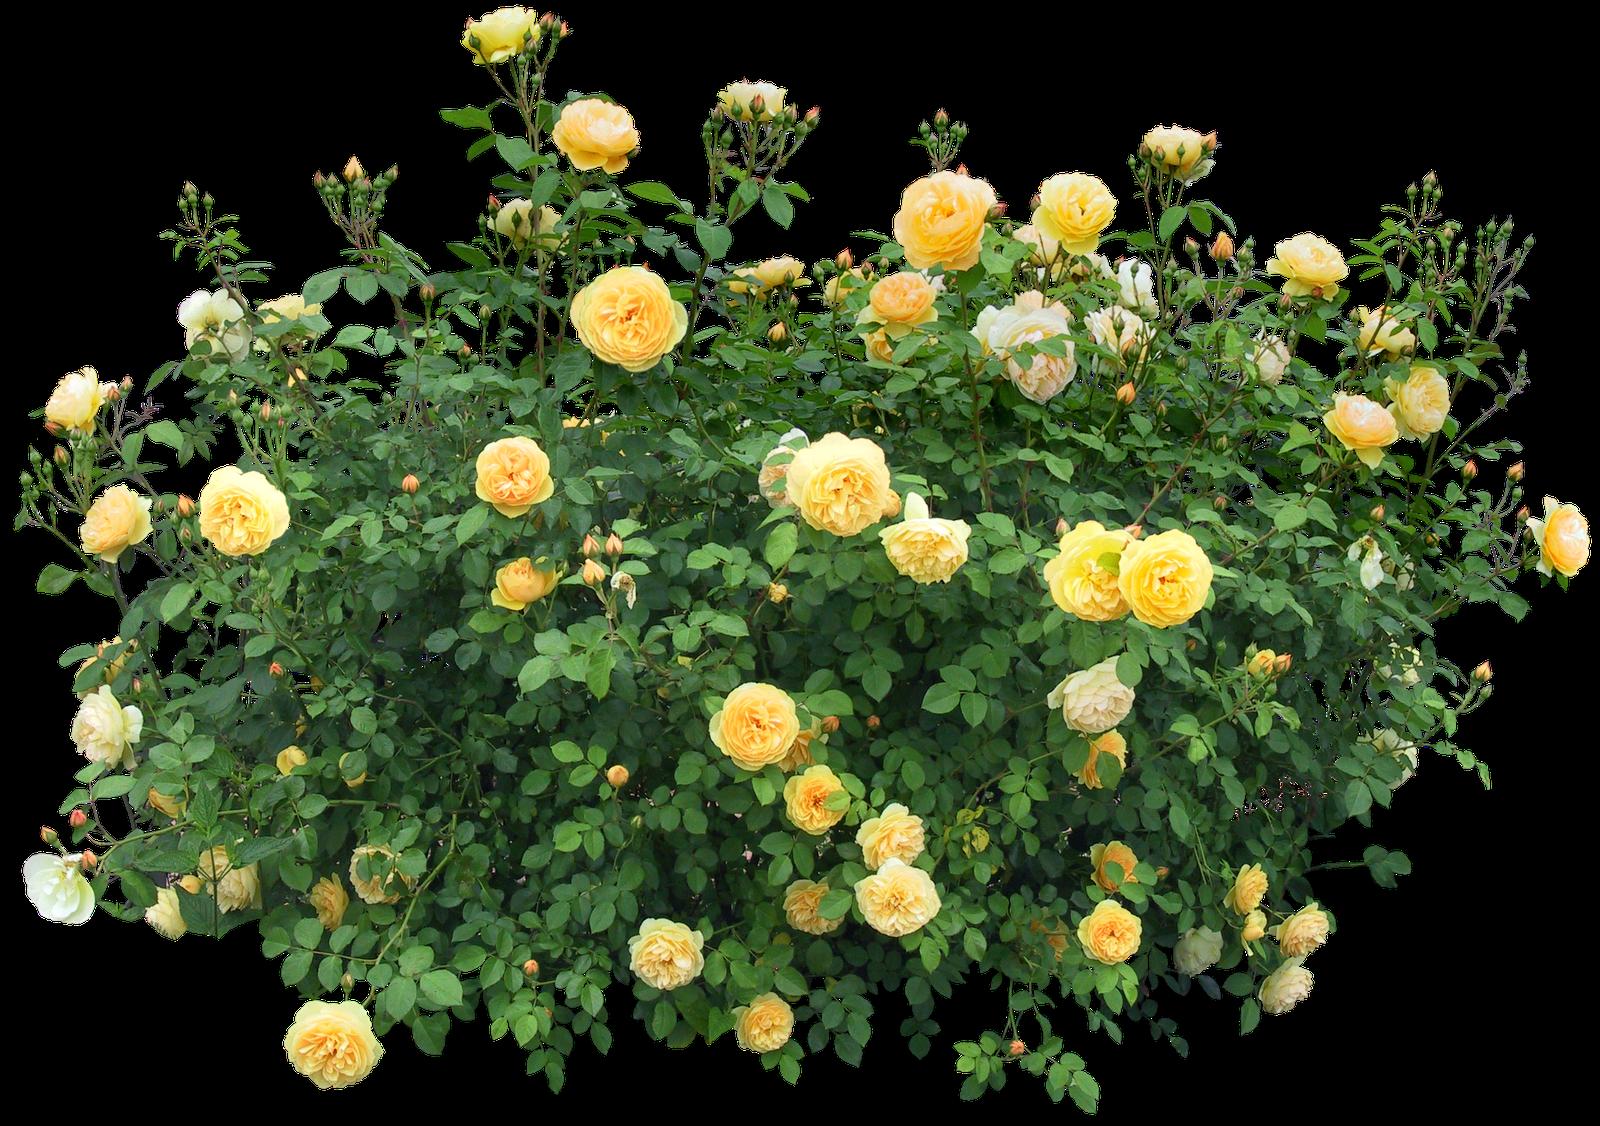 Rose Bush clipart shrub plan #1